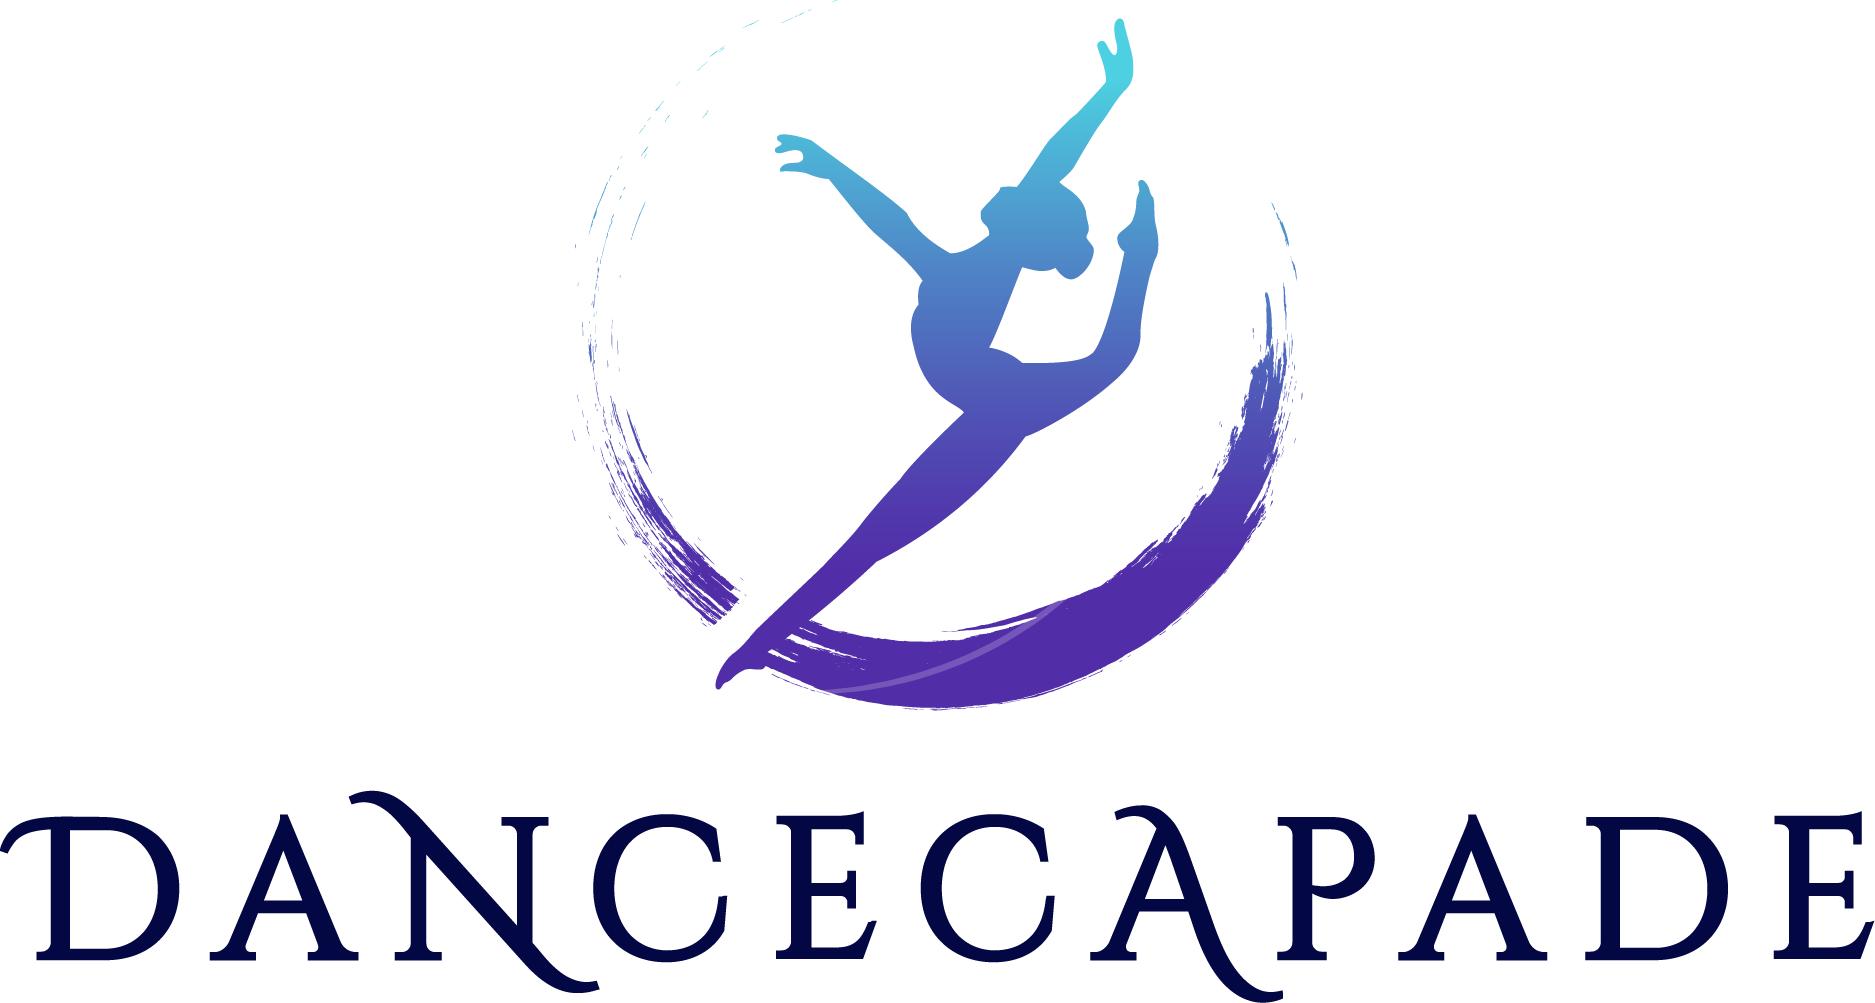 Dancecapade